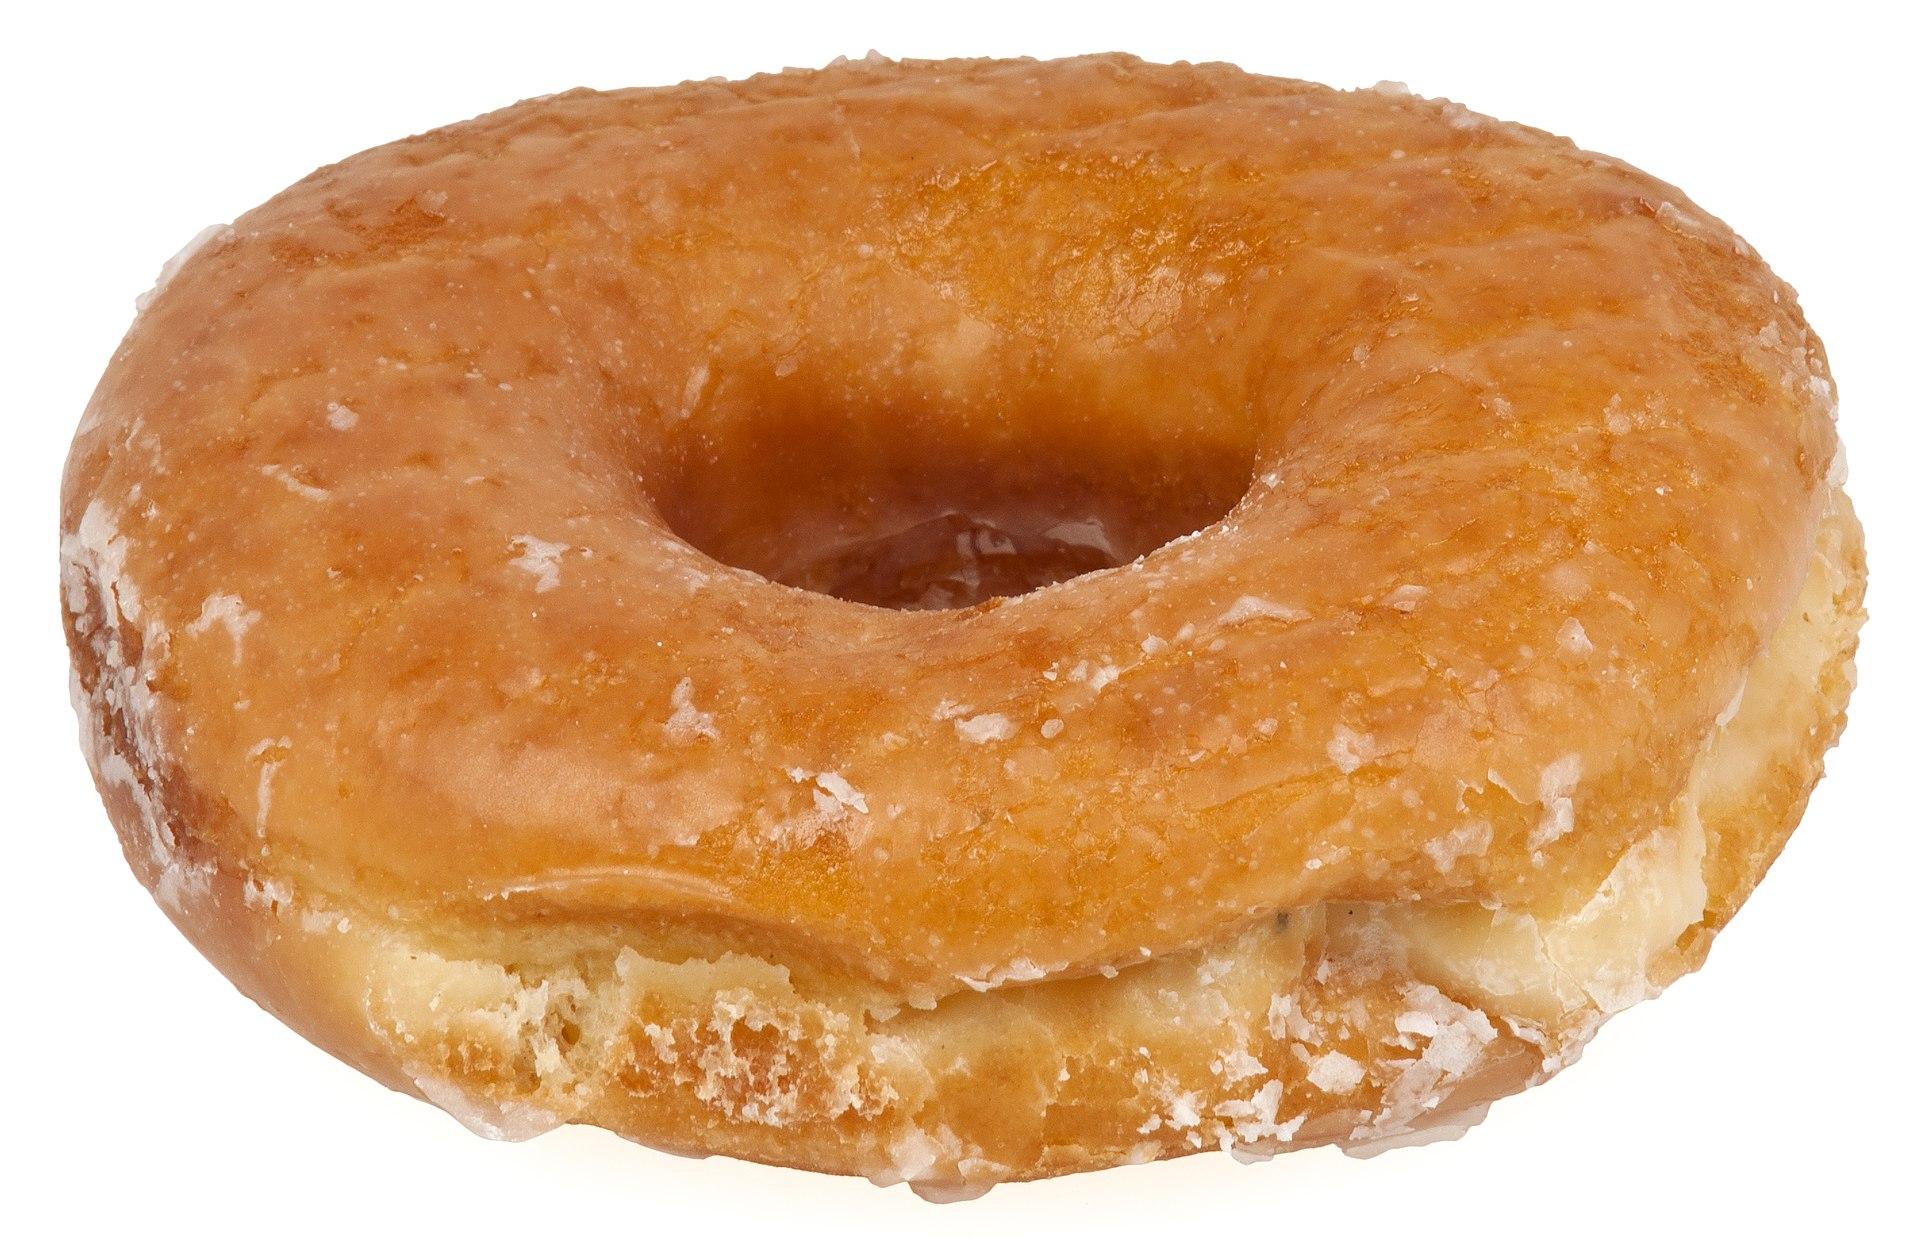 Doughnut - Wikipedia